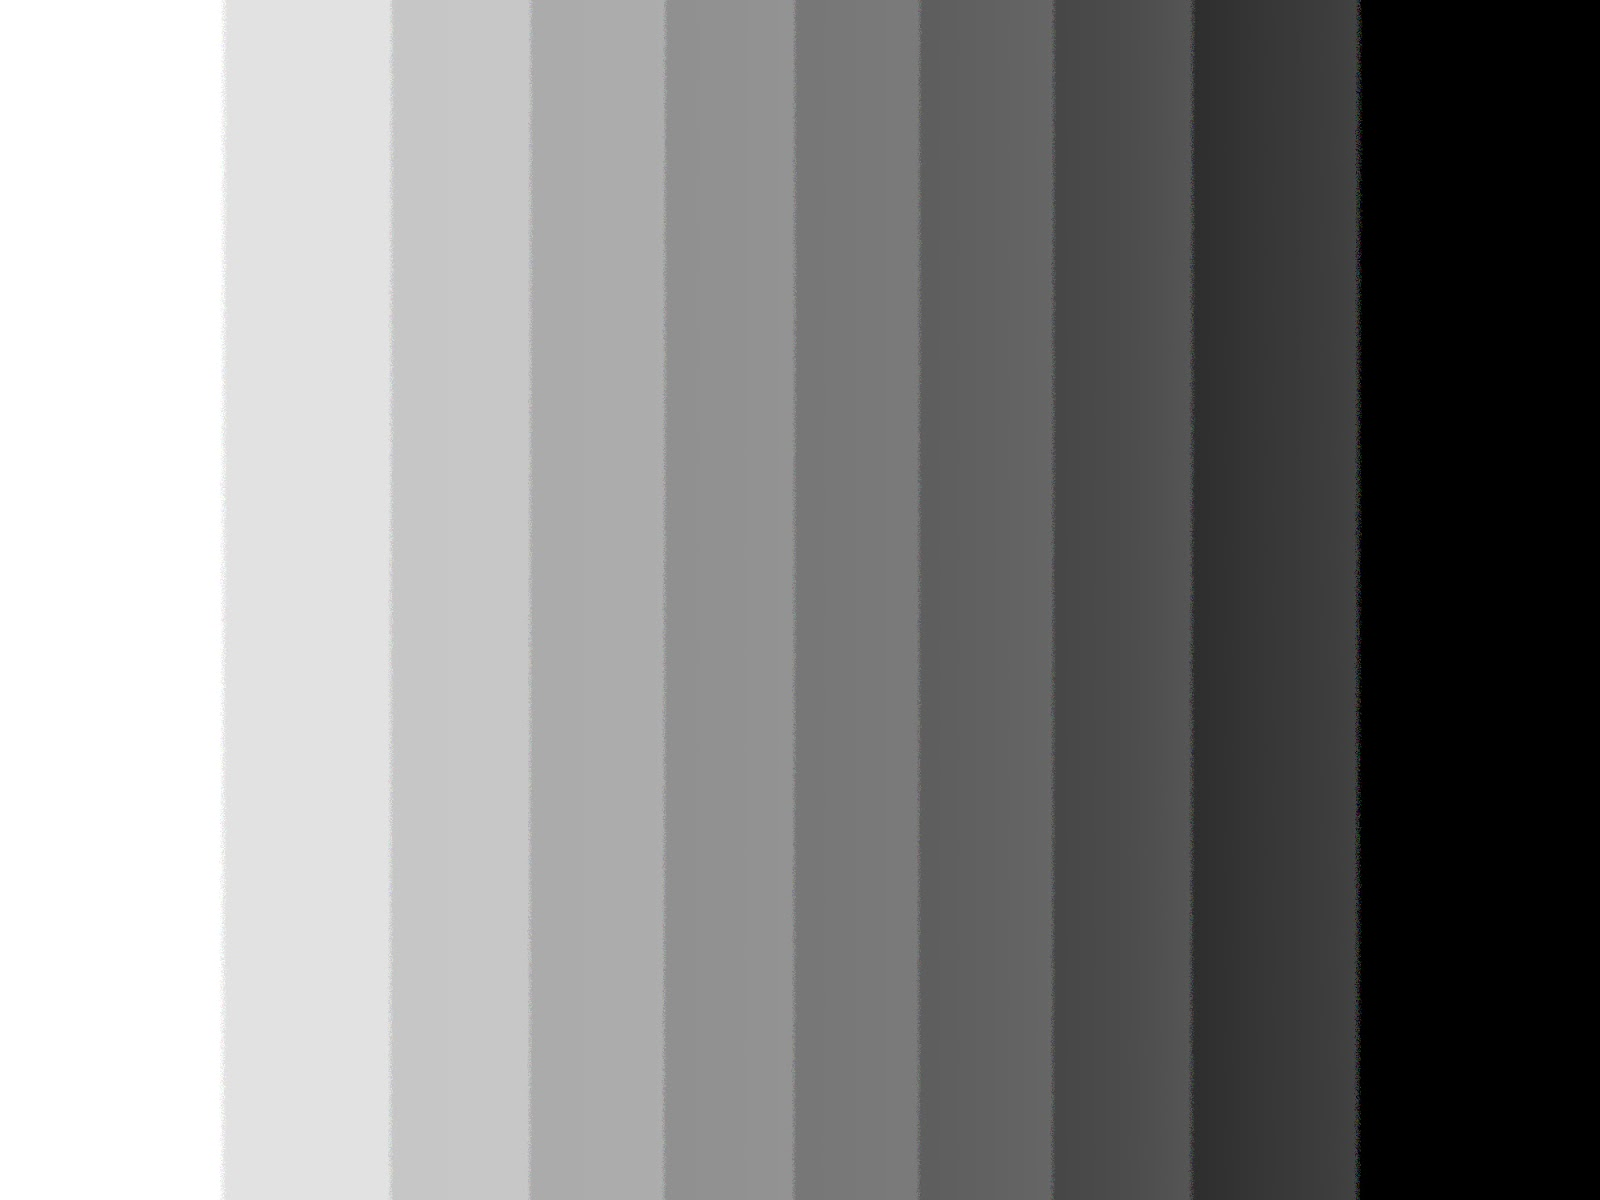 Patxi hinojosa luj n mis cosas paleta de grises for Paleta de colores grises